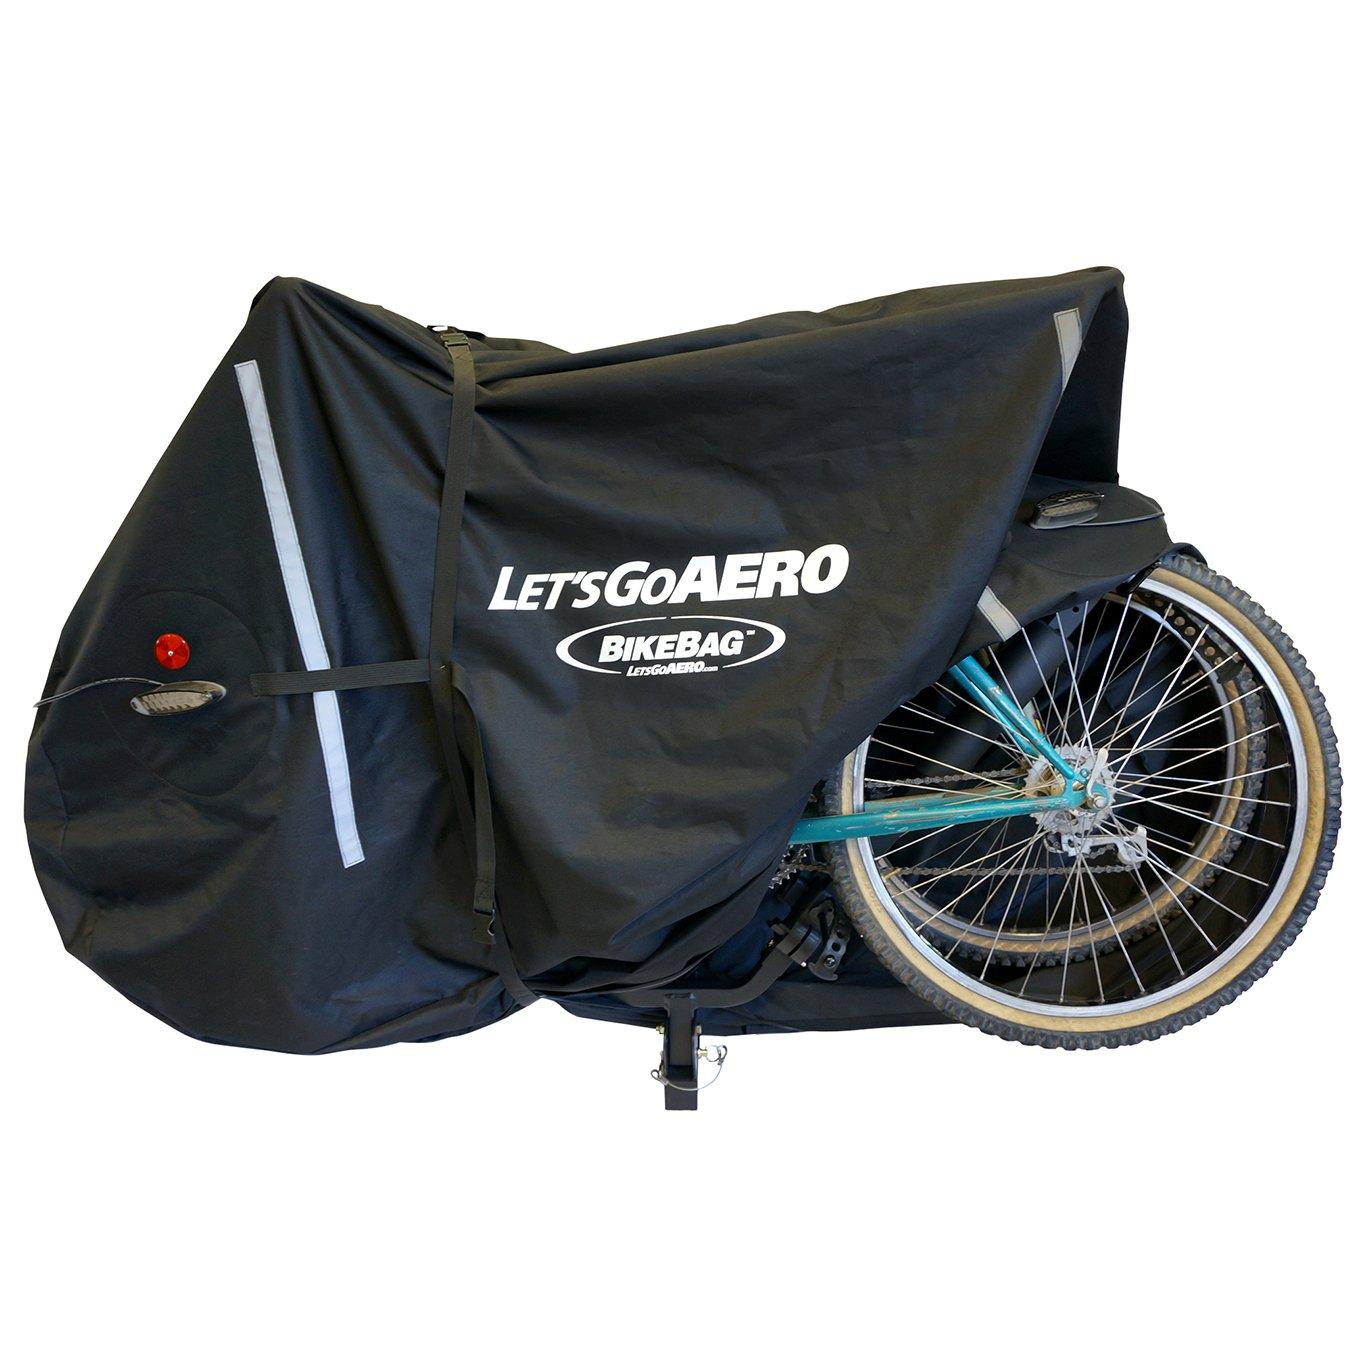 Let's Go Aero BikeBag 2-Bike Cover With LED